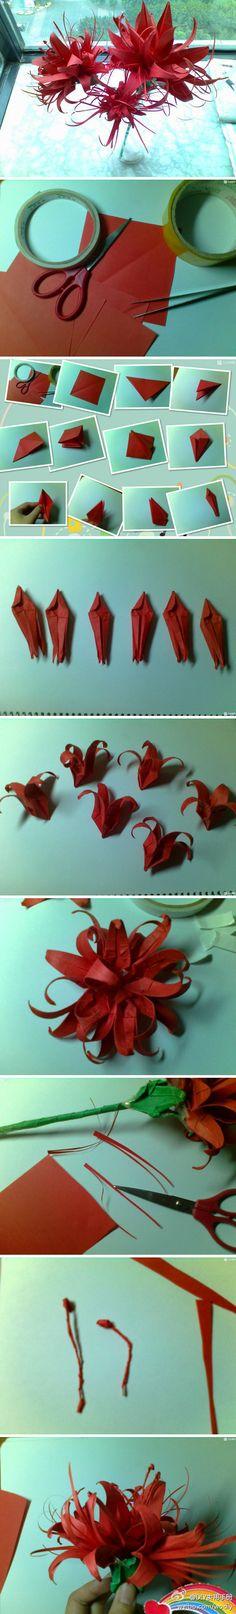 曼珠沙华折纸,Cool Flower Crafts , Paper Crafts for Teens , paper, craft, flower,wrap, gift, decor,blumen,basteln,bastelvorlage,tutorial diy, spring kids crafts, paper flowers,diy, bauble, ornament